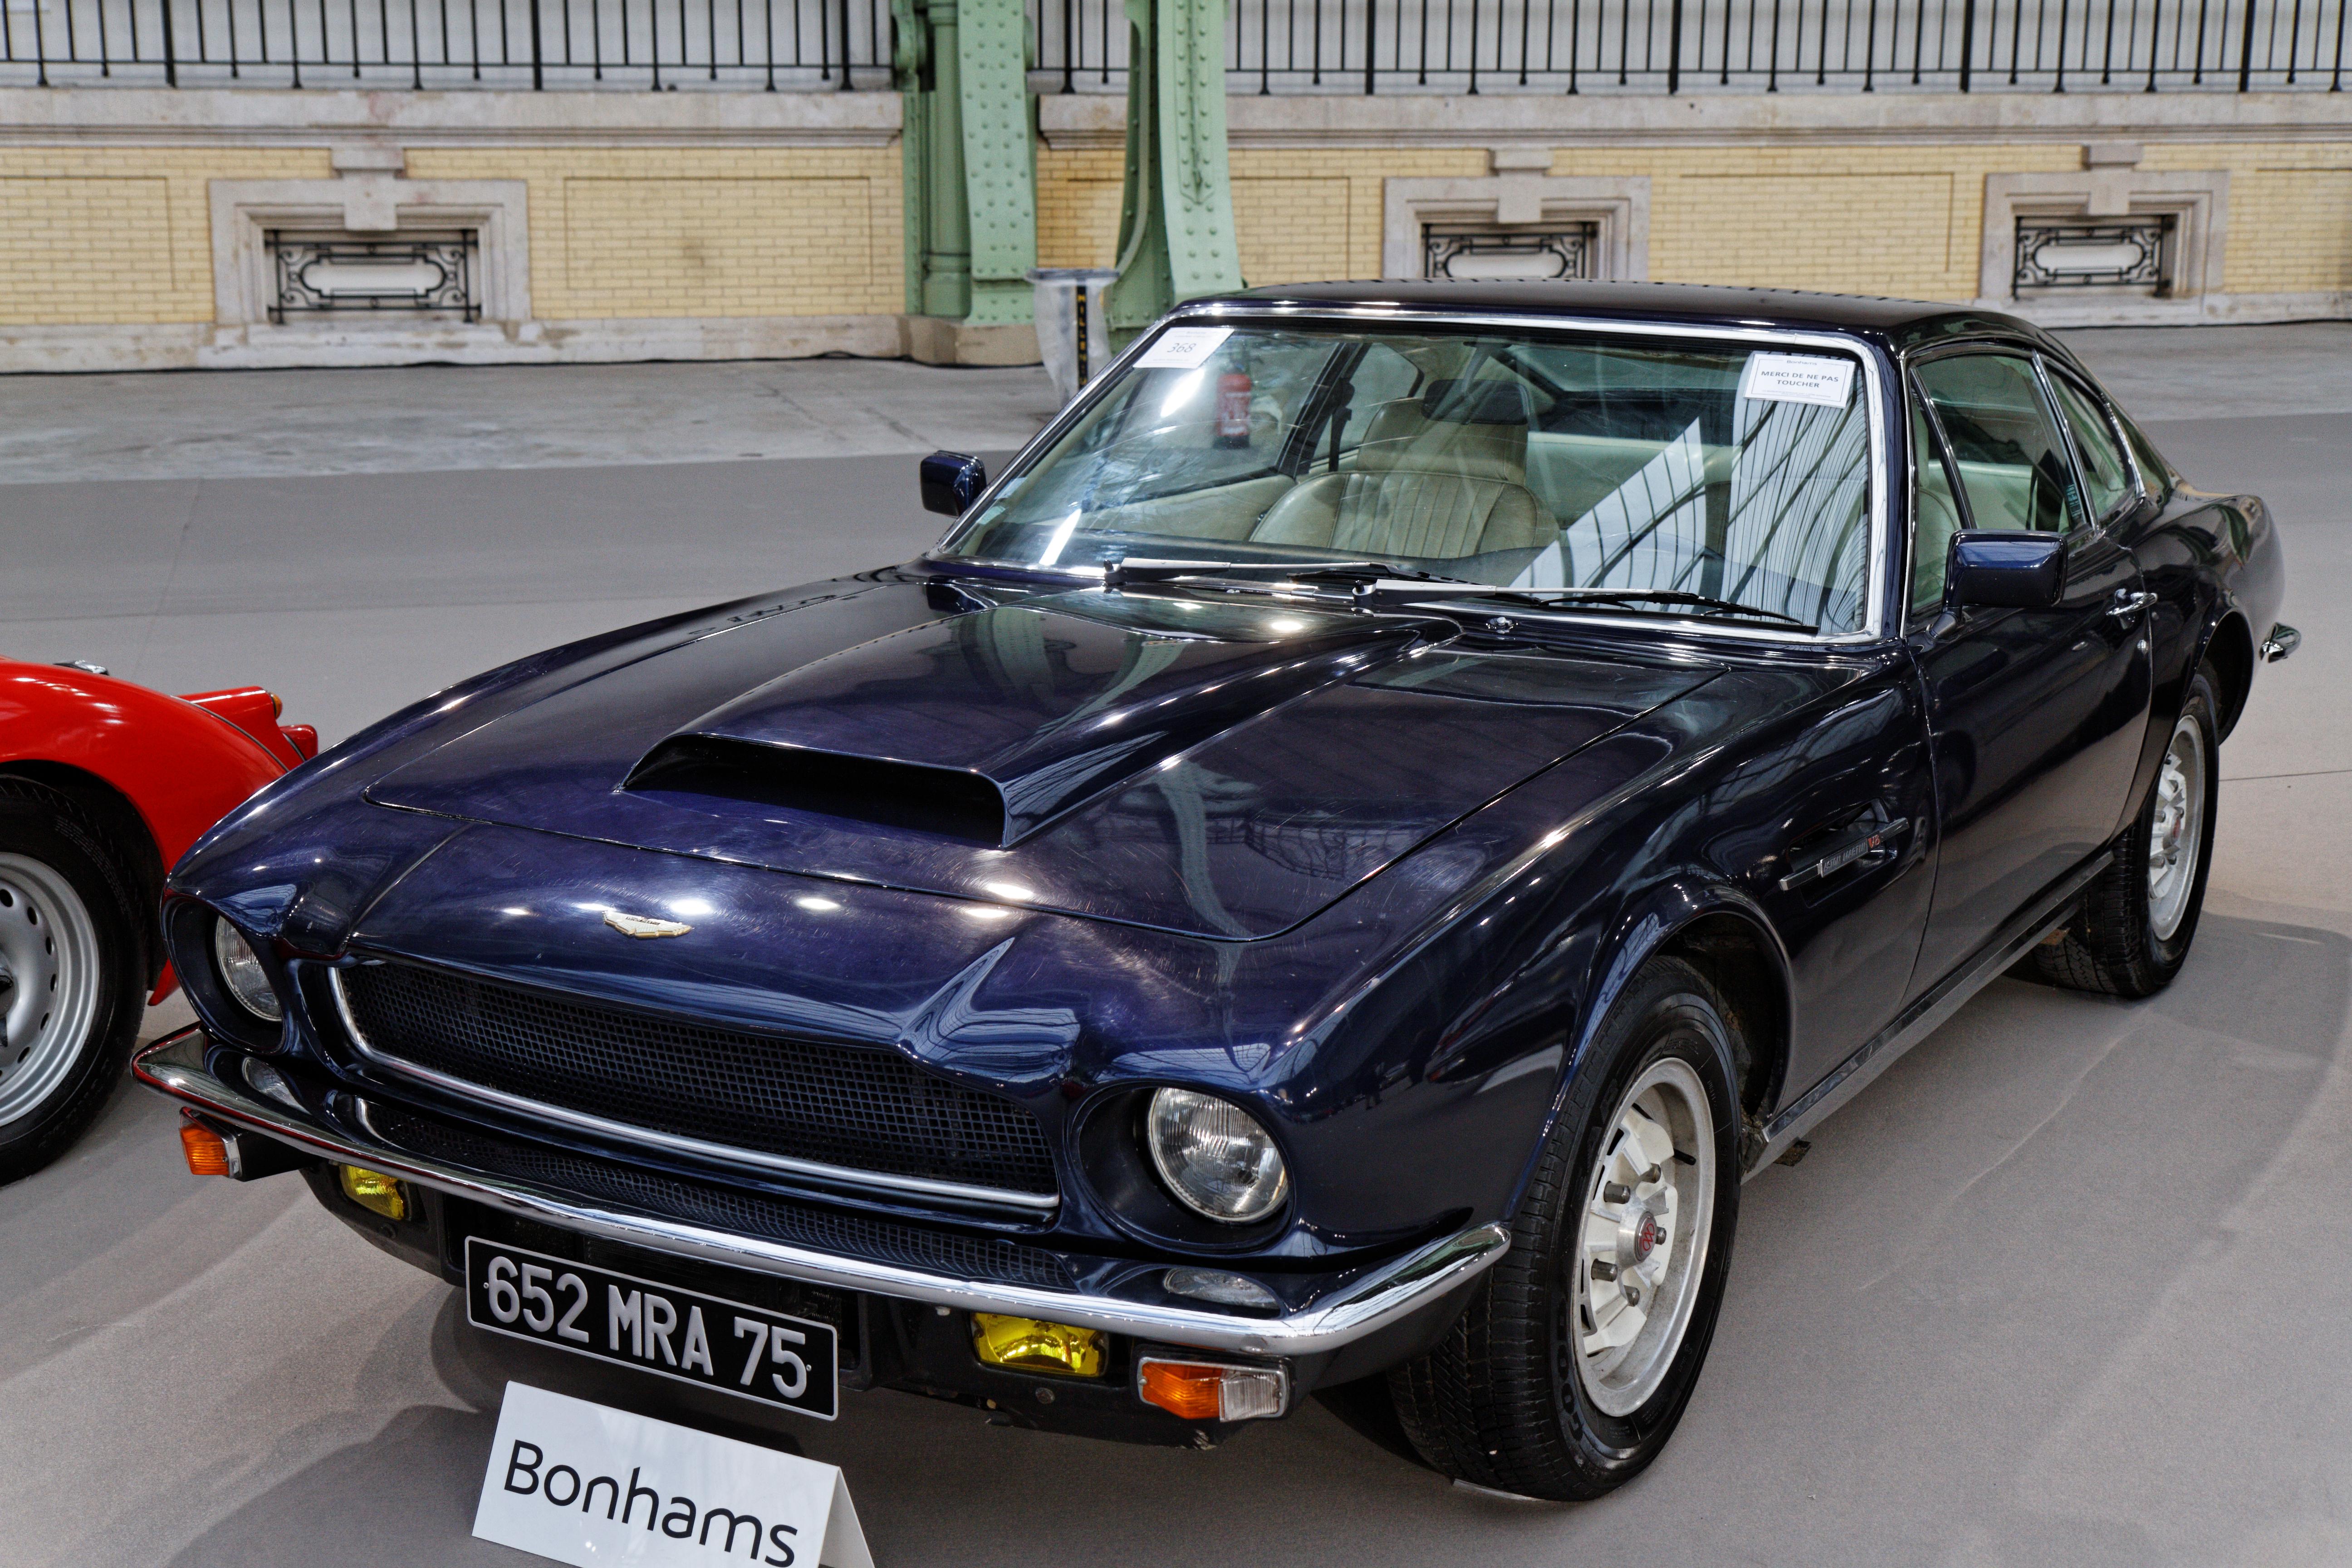 File Paris Bonhams 2014 Aston Martin V8 Sports Saloon 1975 002 Jpg Wikimedia Commons